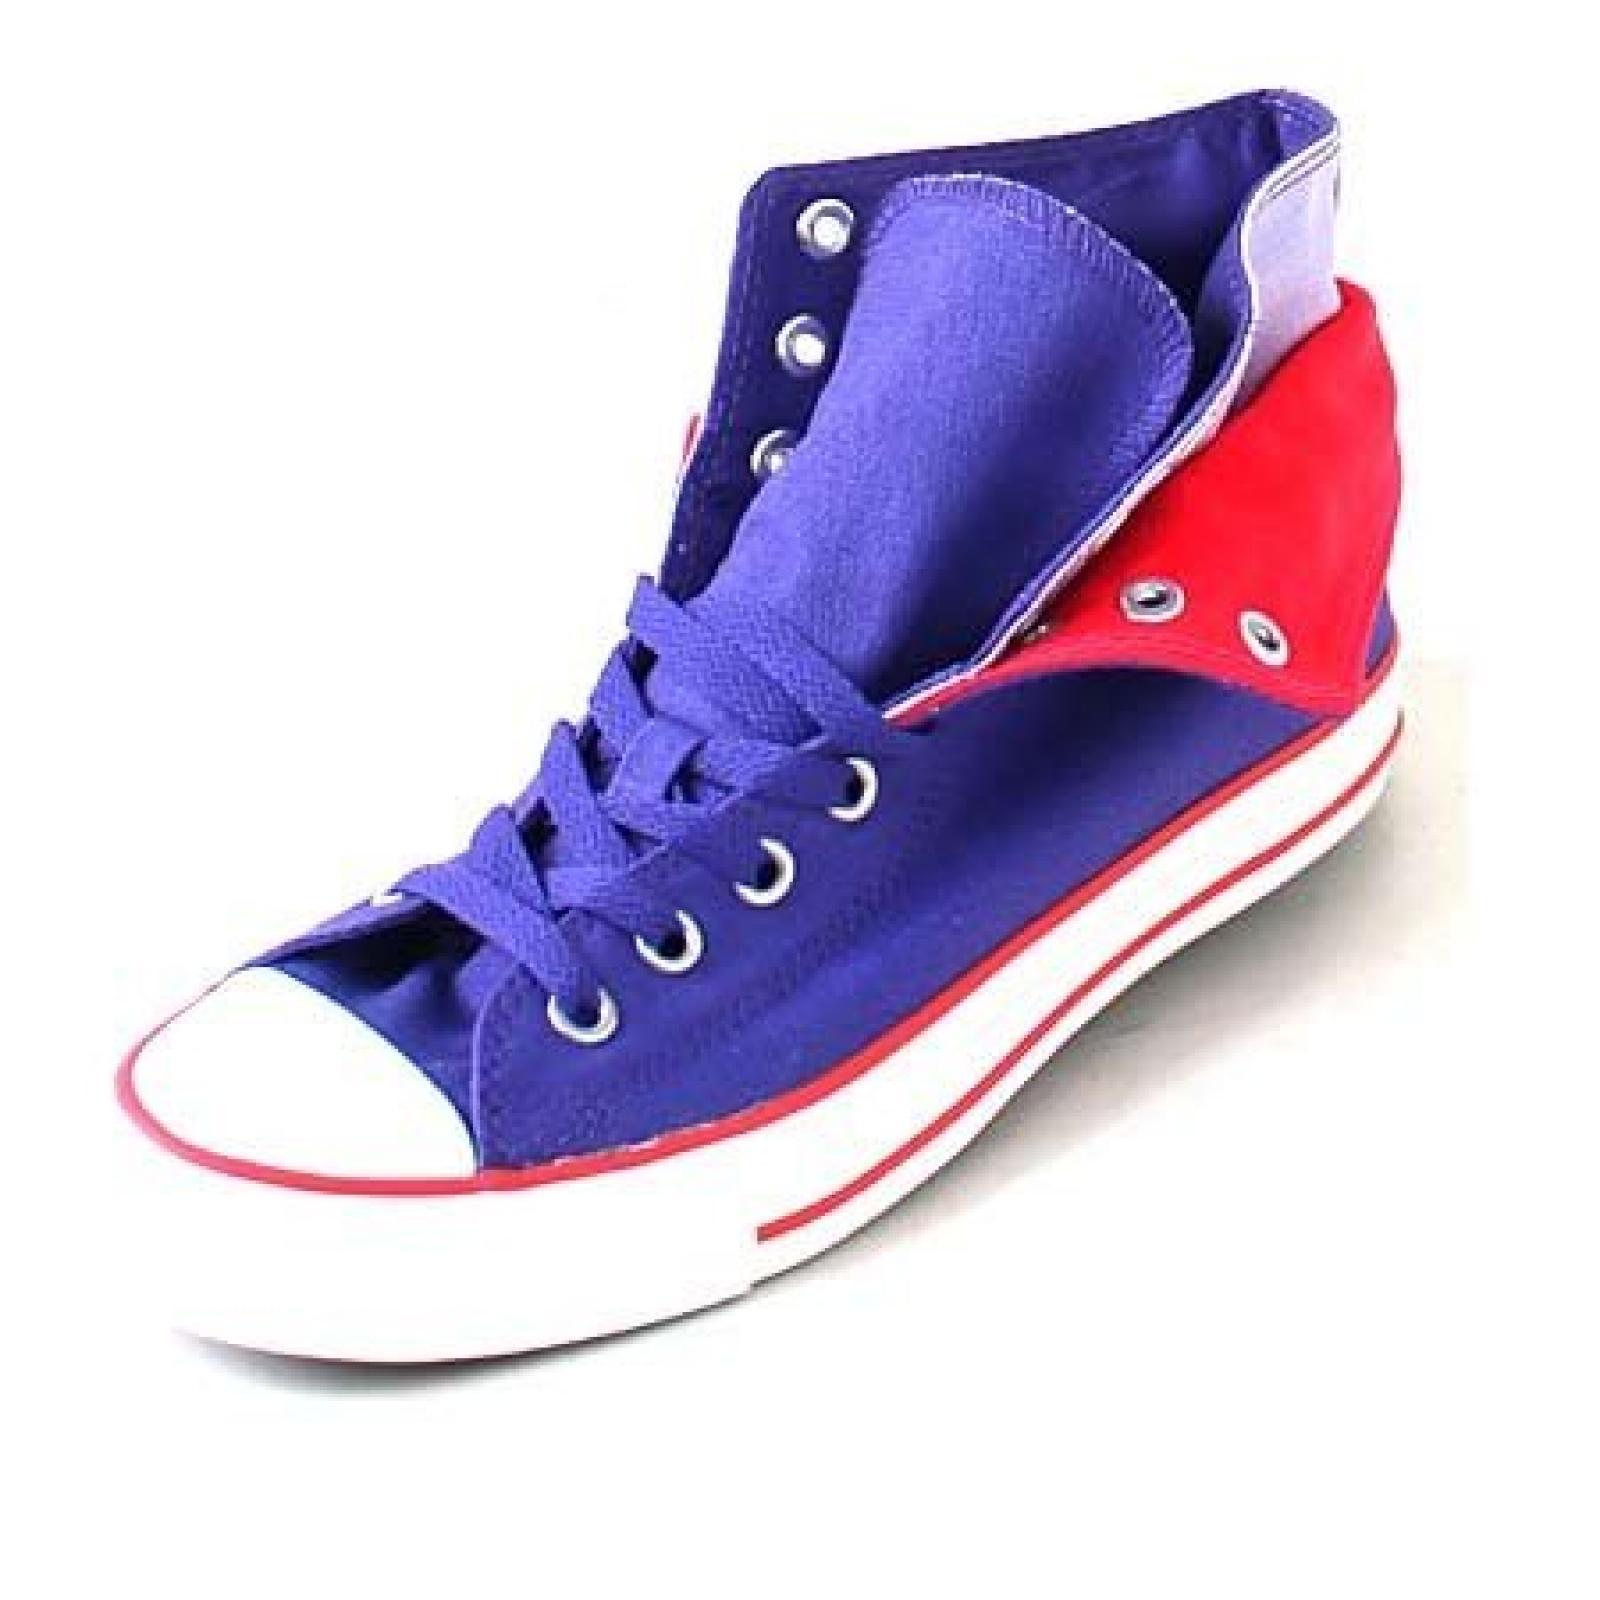 Converse Chuck Taylor All Star Two Fold High Sneaker Damen